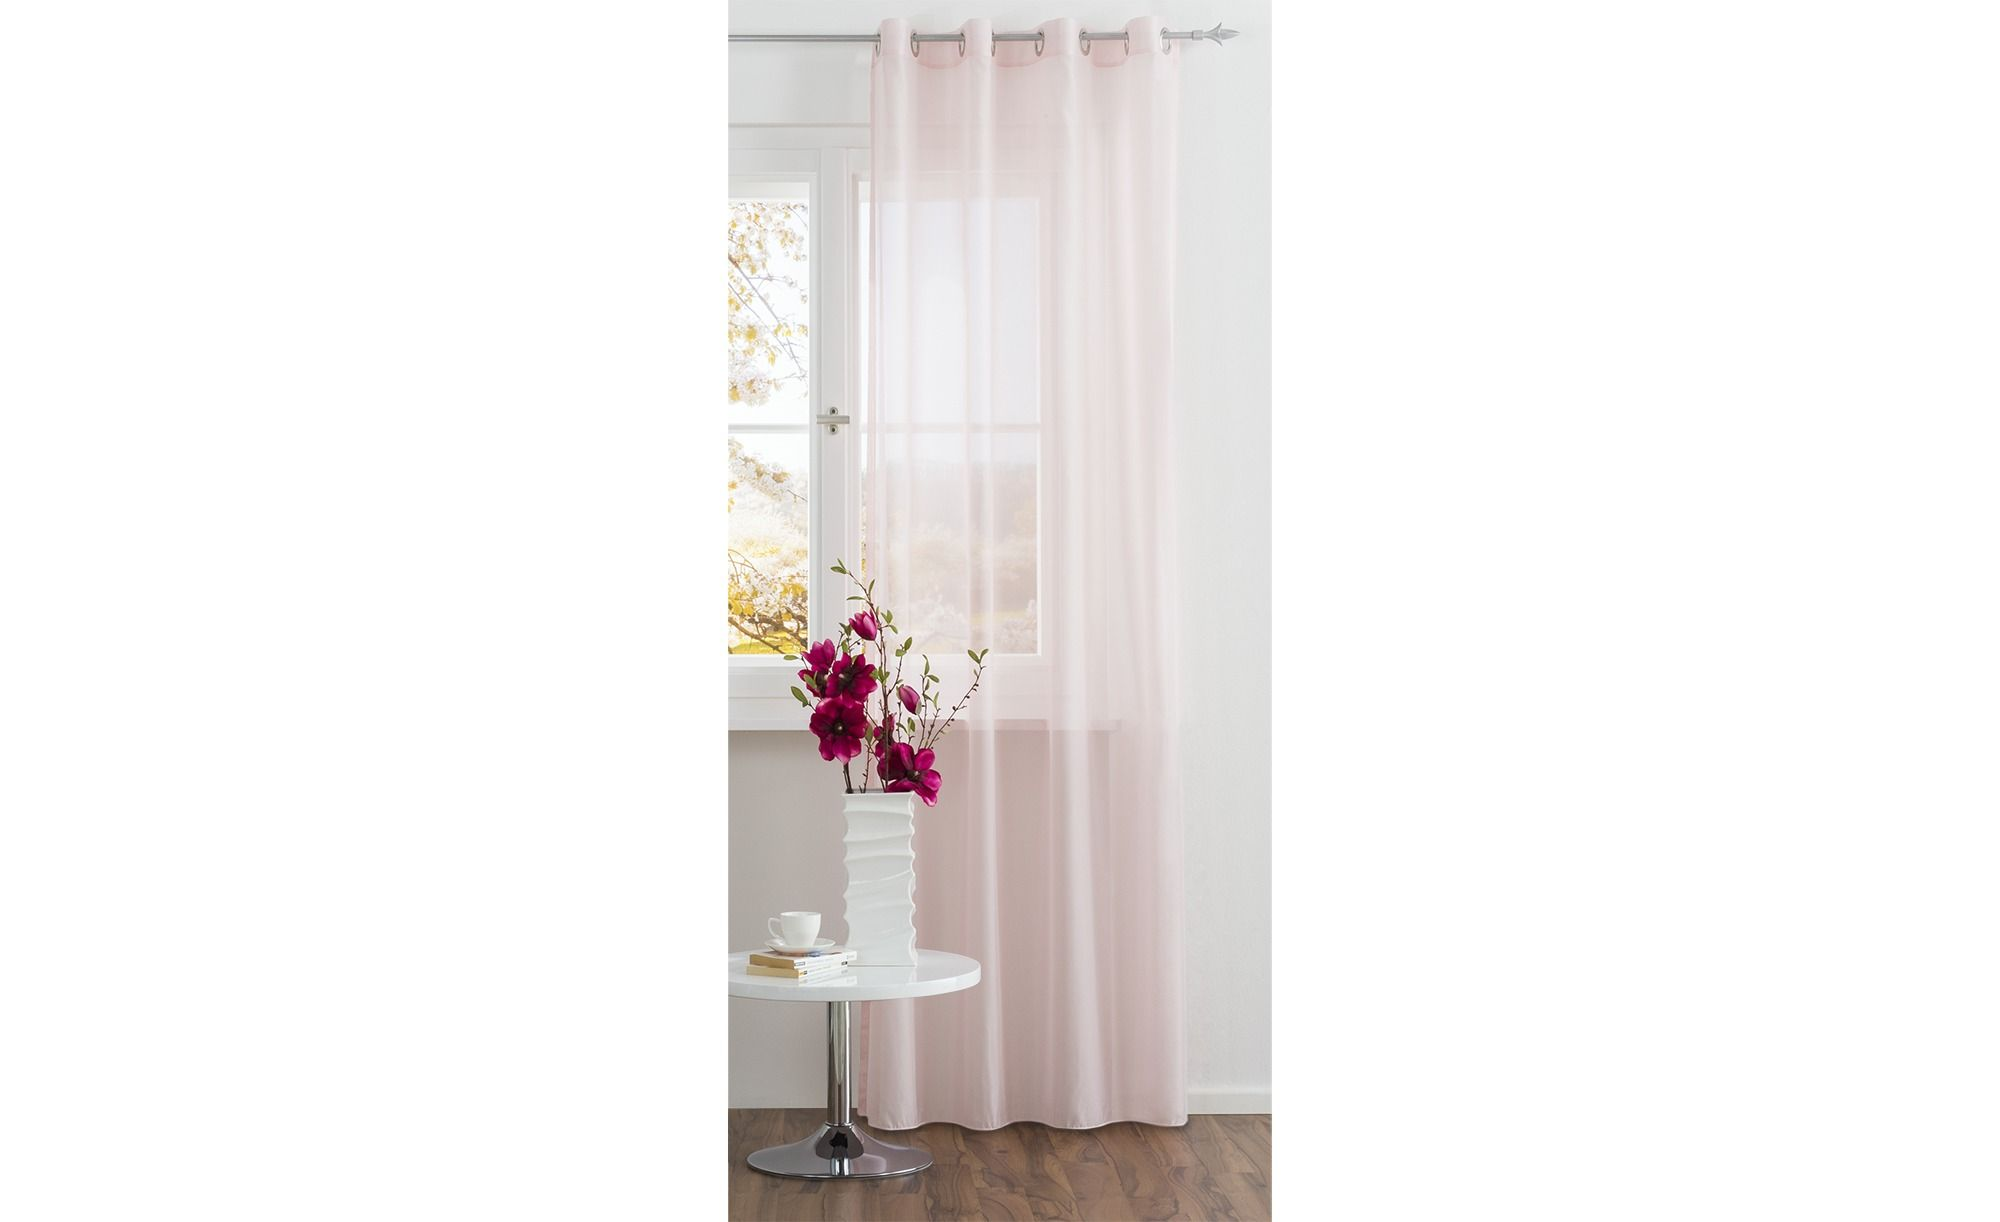 Ösenschal vorhang transparent voile gardinen pinterest room